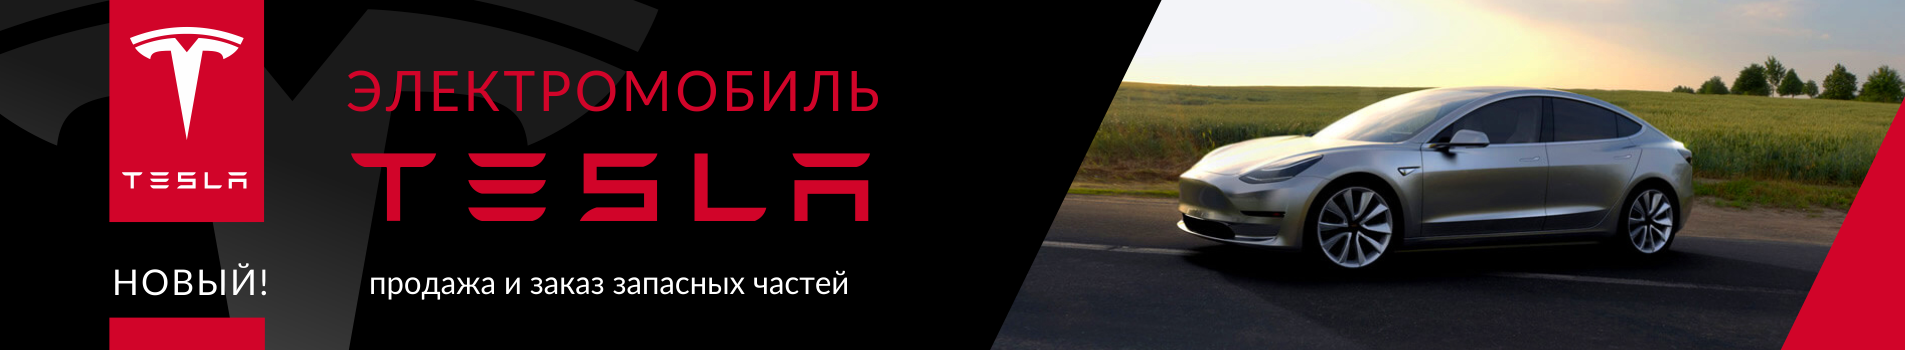 tesla_1905x350RUS_c